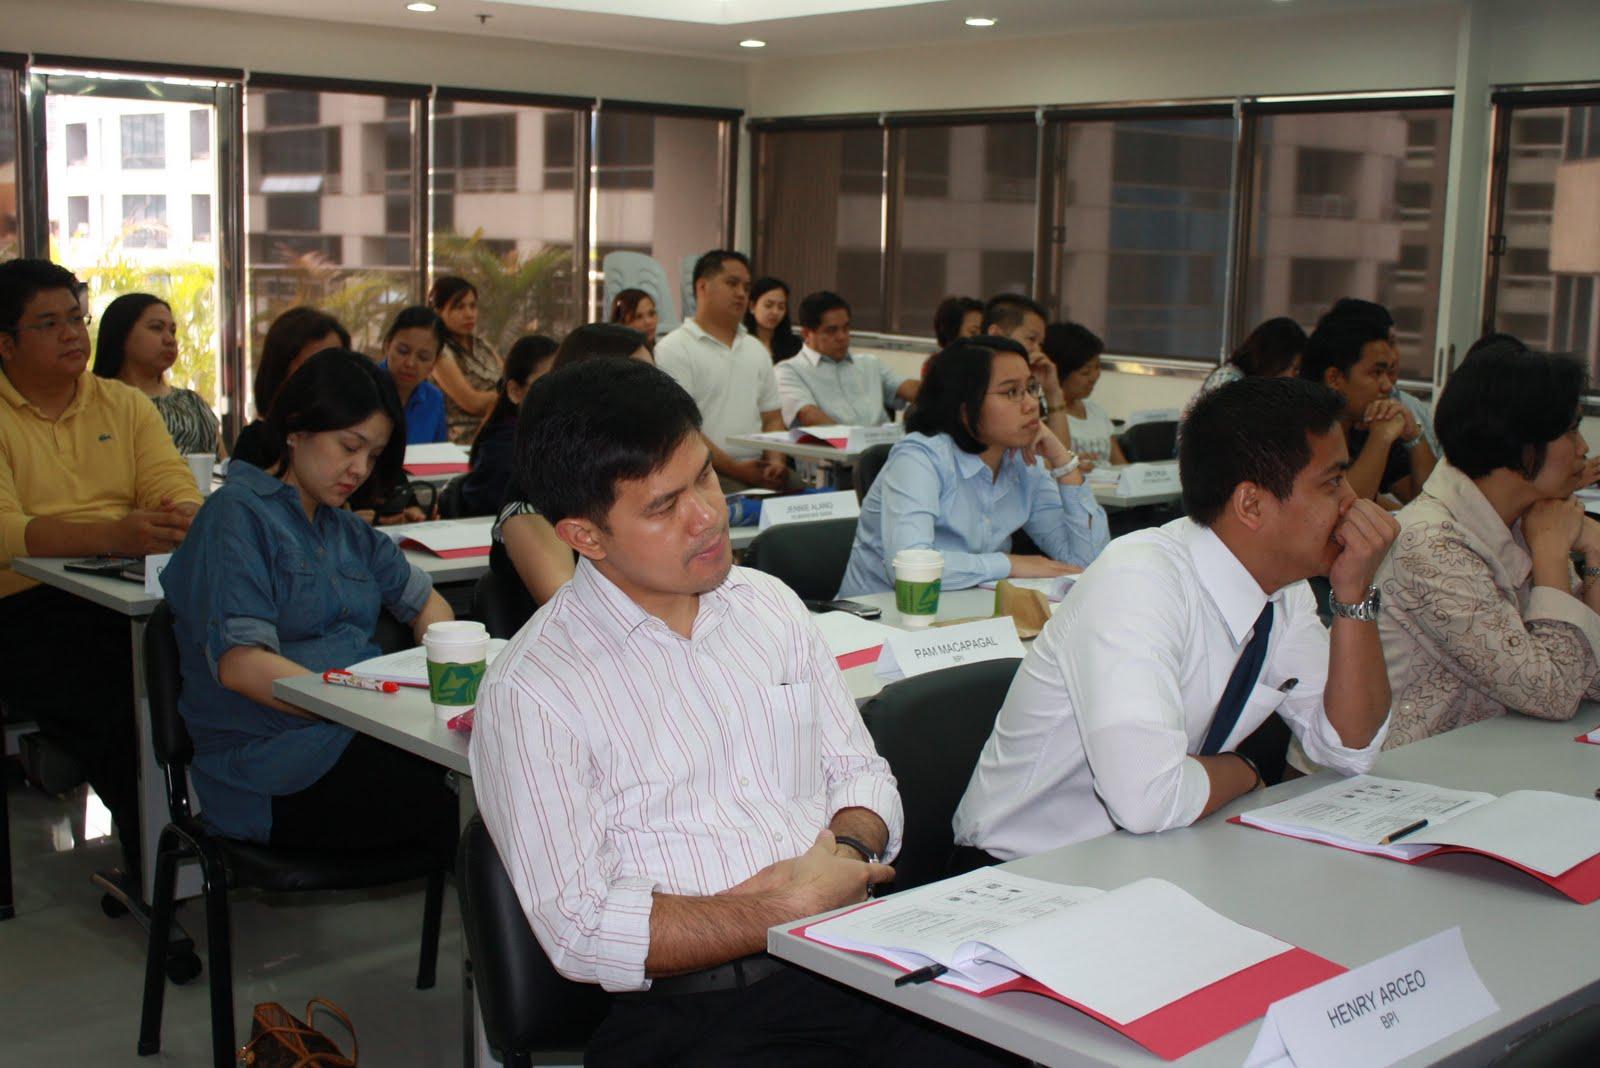 Advance FS Analysis and Advance Economics Seminar - March 18, 2011 (Training Room, ACI-MART Office)